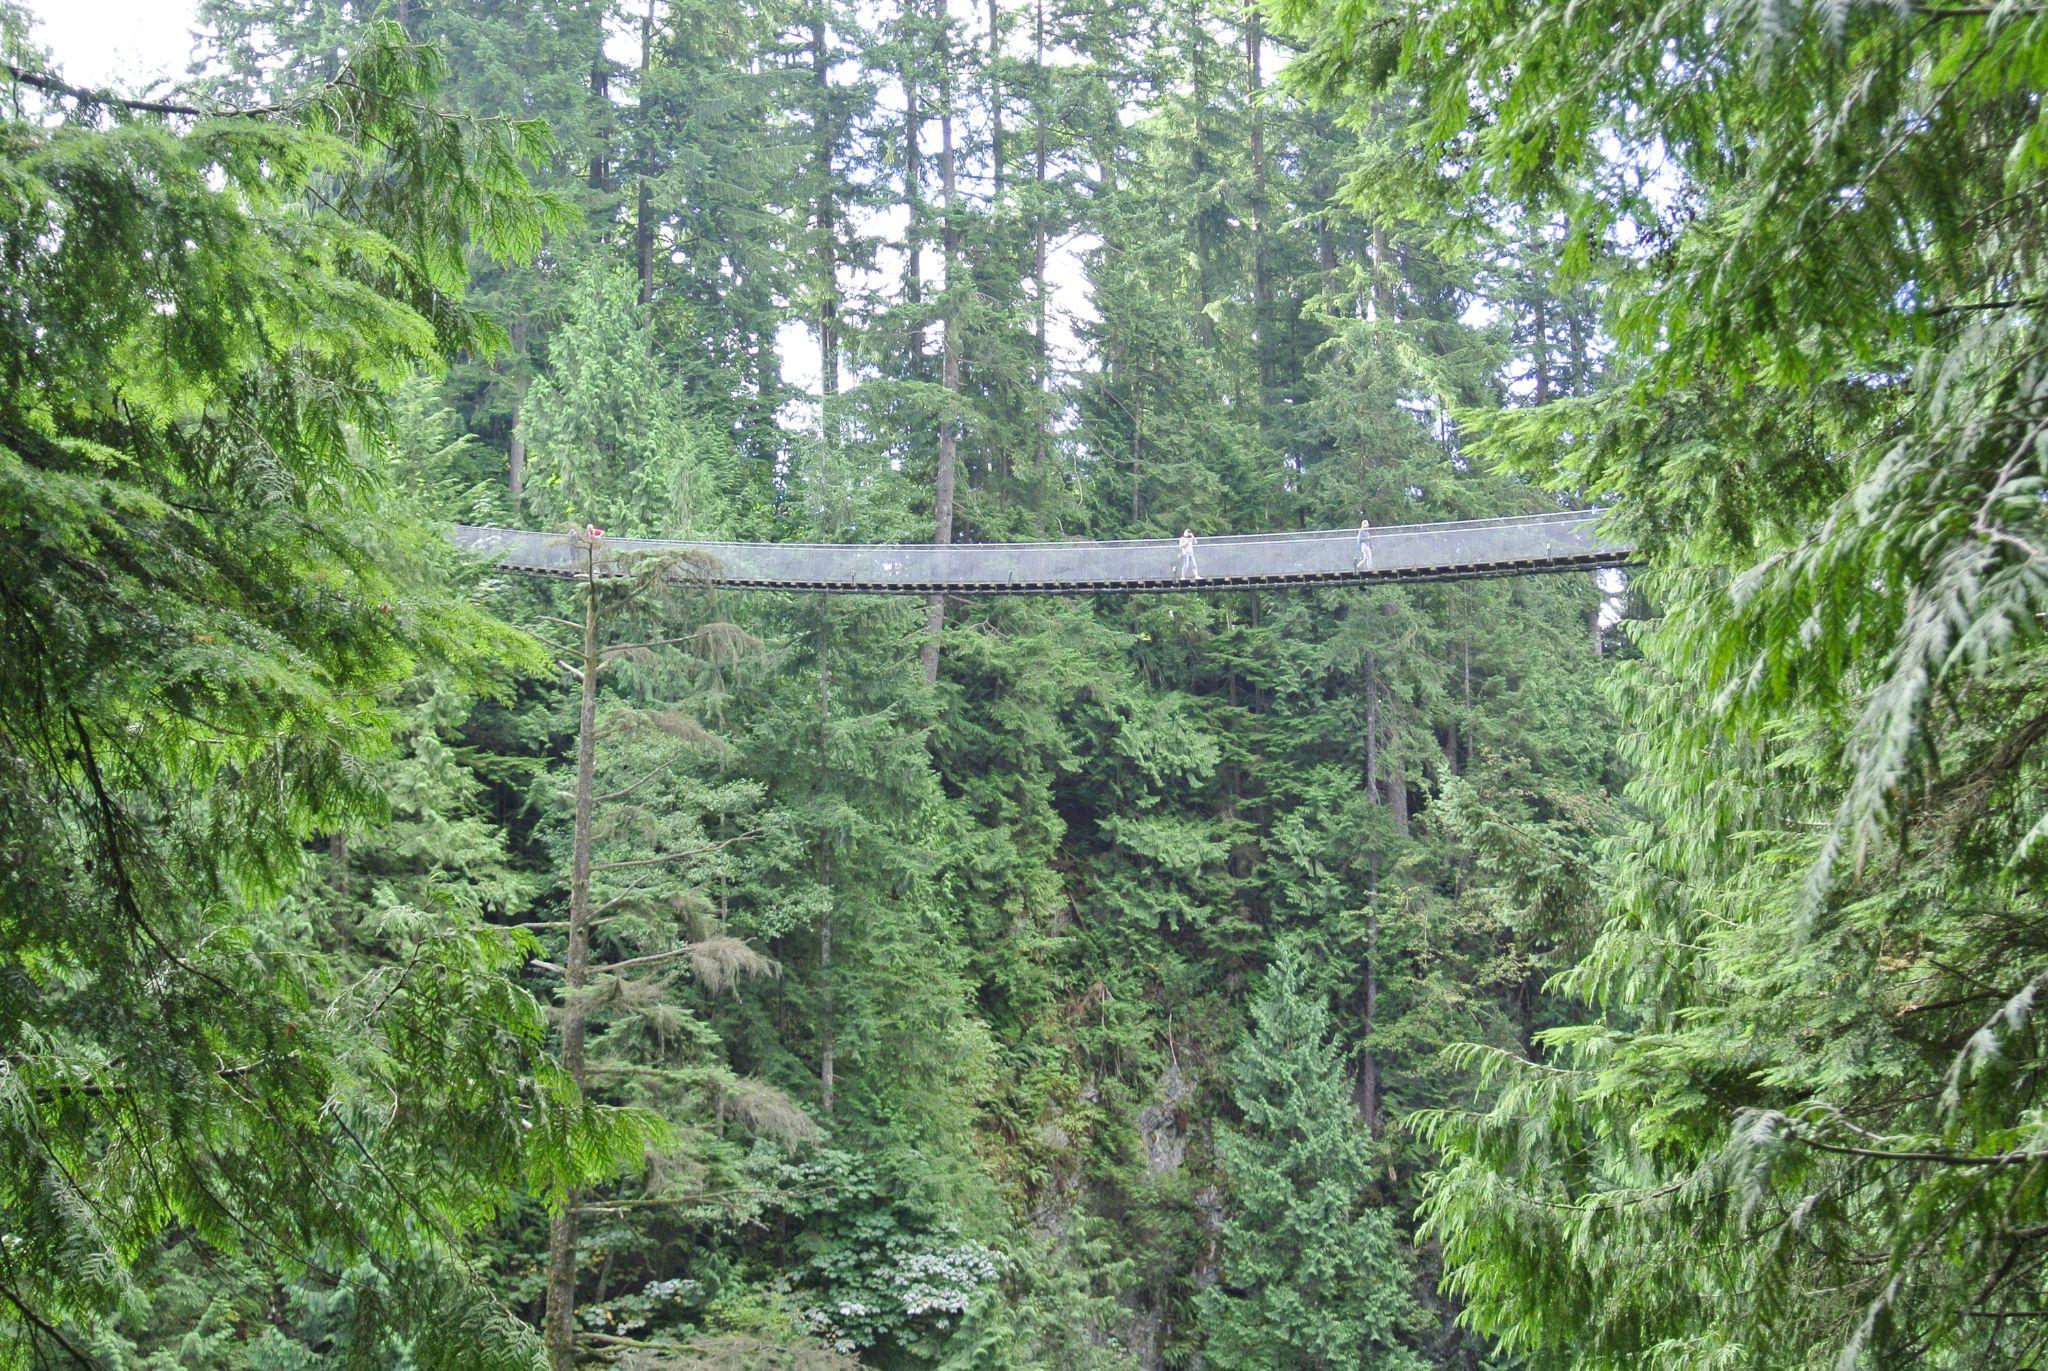 Capilano suspension bridge by Photogenic Studio